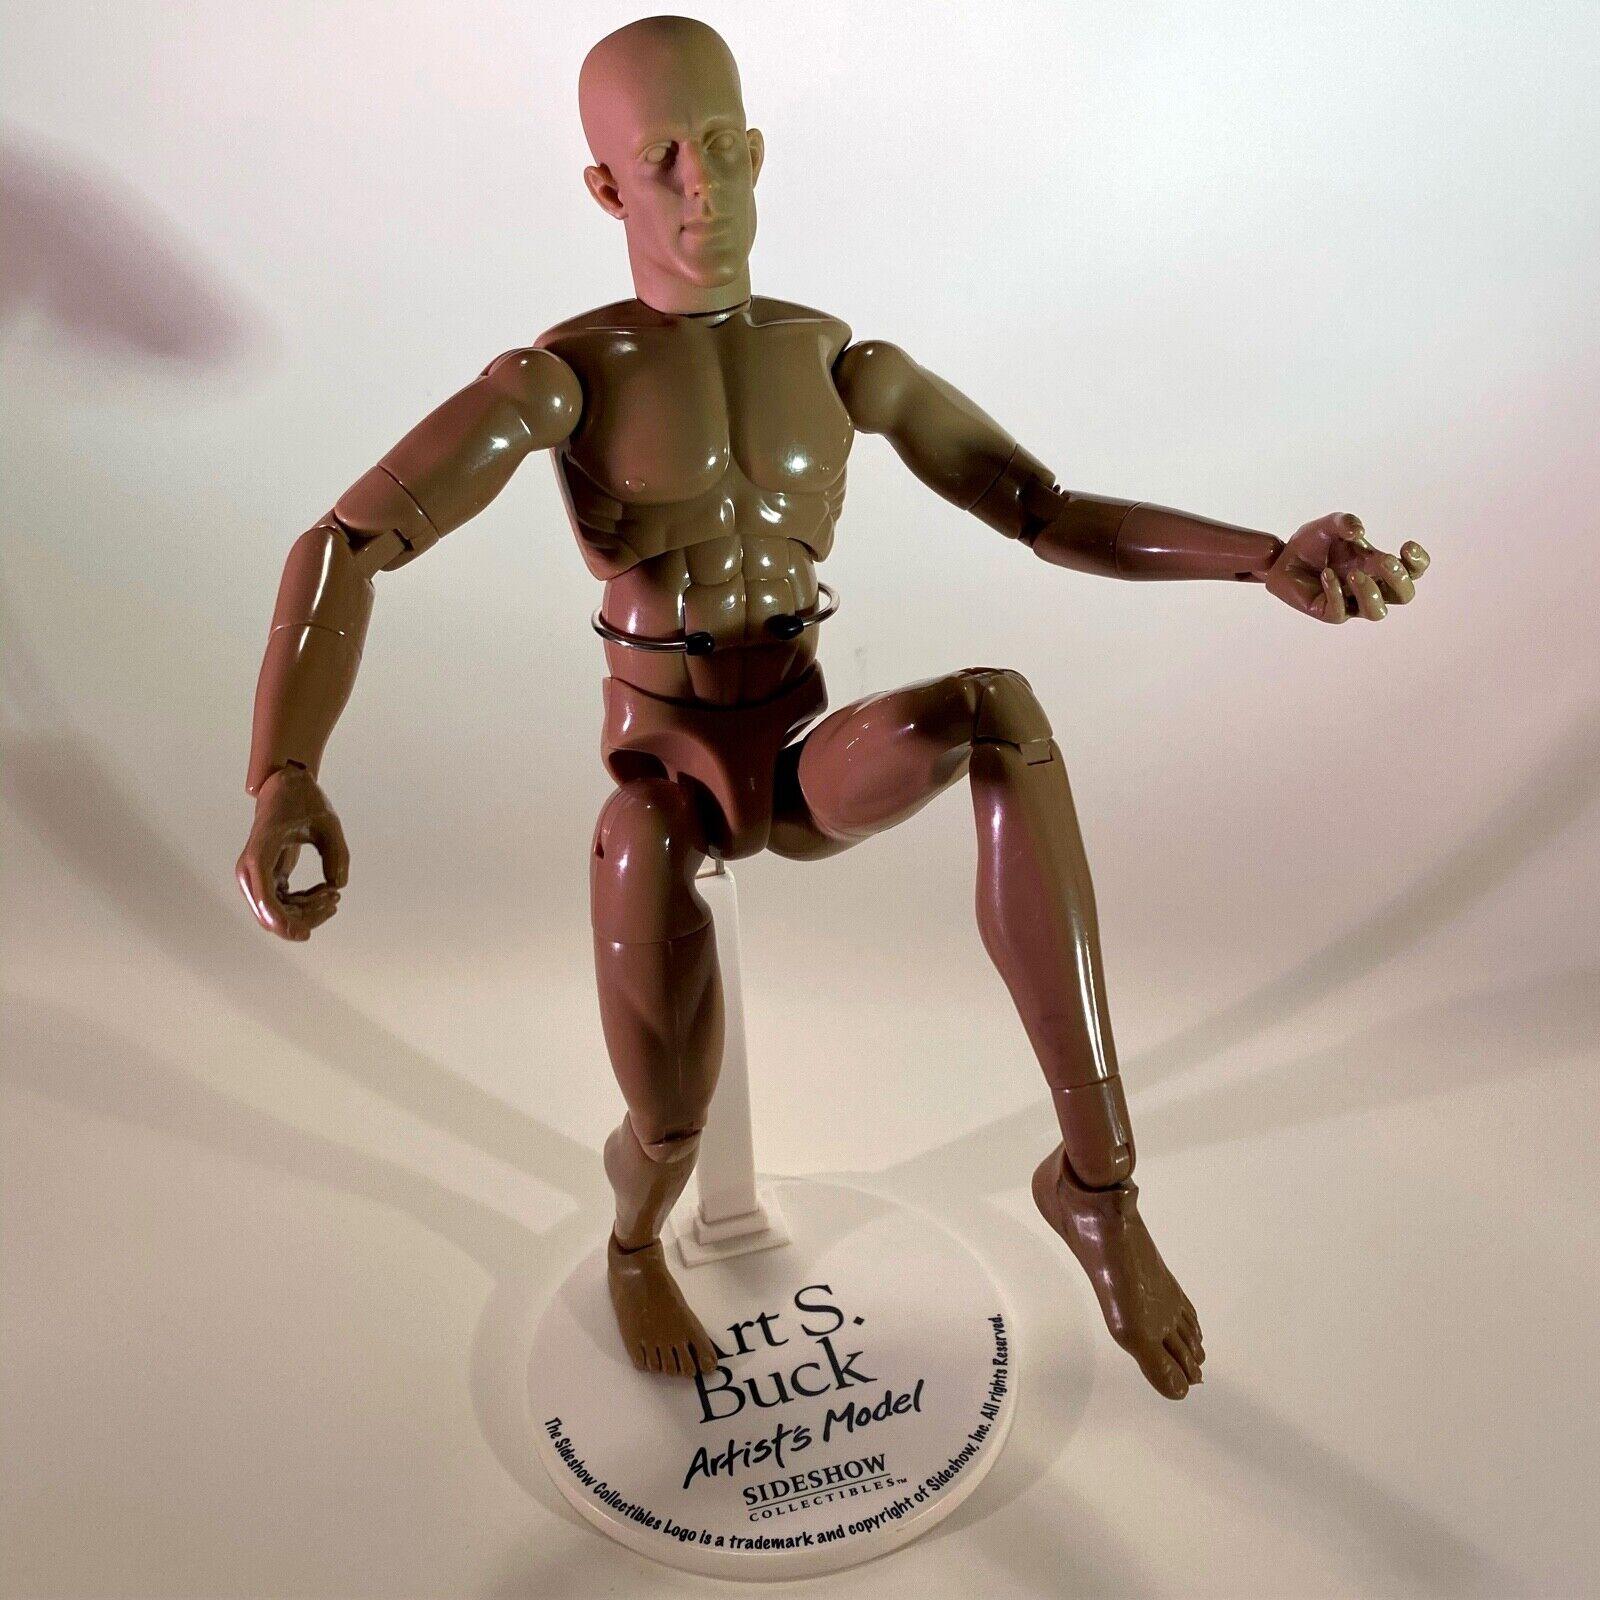 "Sideshow Art S Buck 1/6 Scale Male Nude Artist Model 12"" Action Figure on eBay thumbnail"